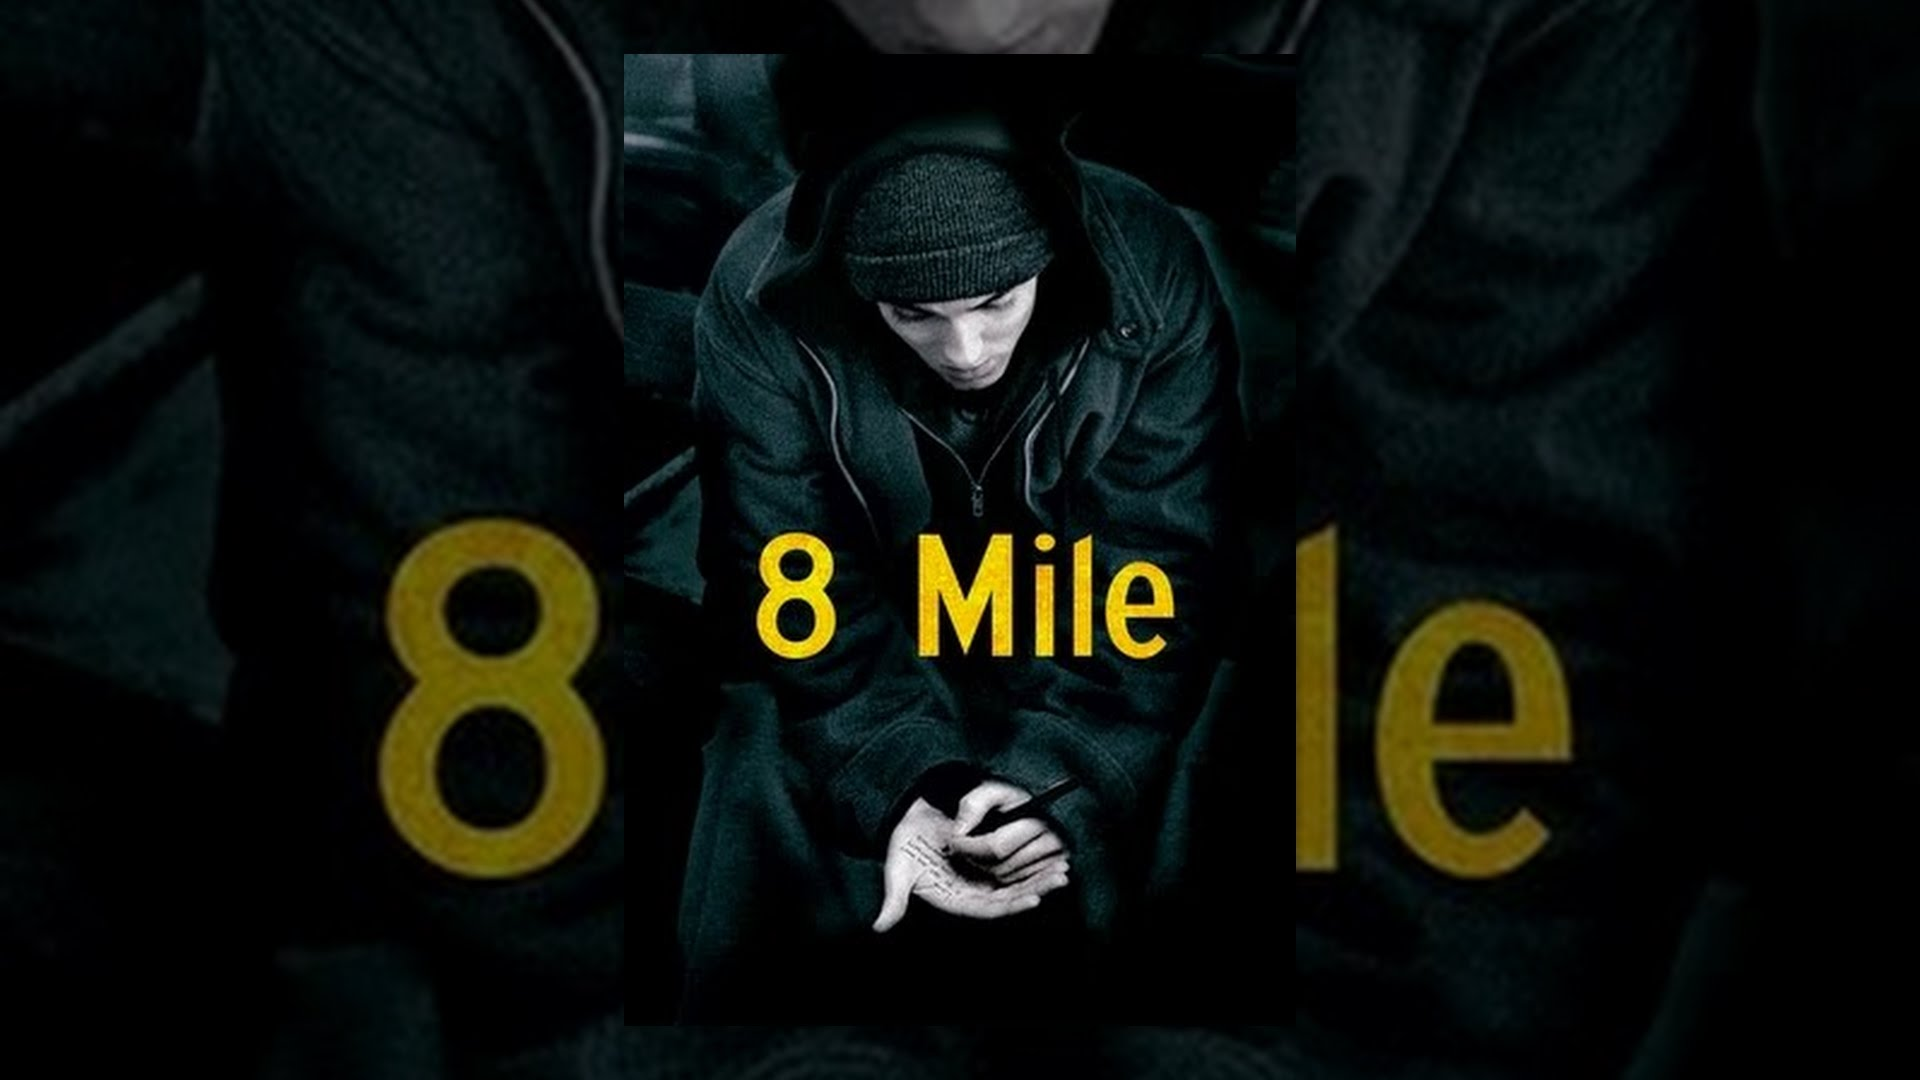 Download 8 Mile